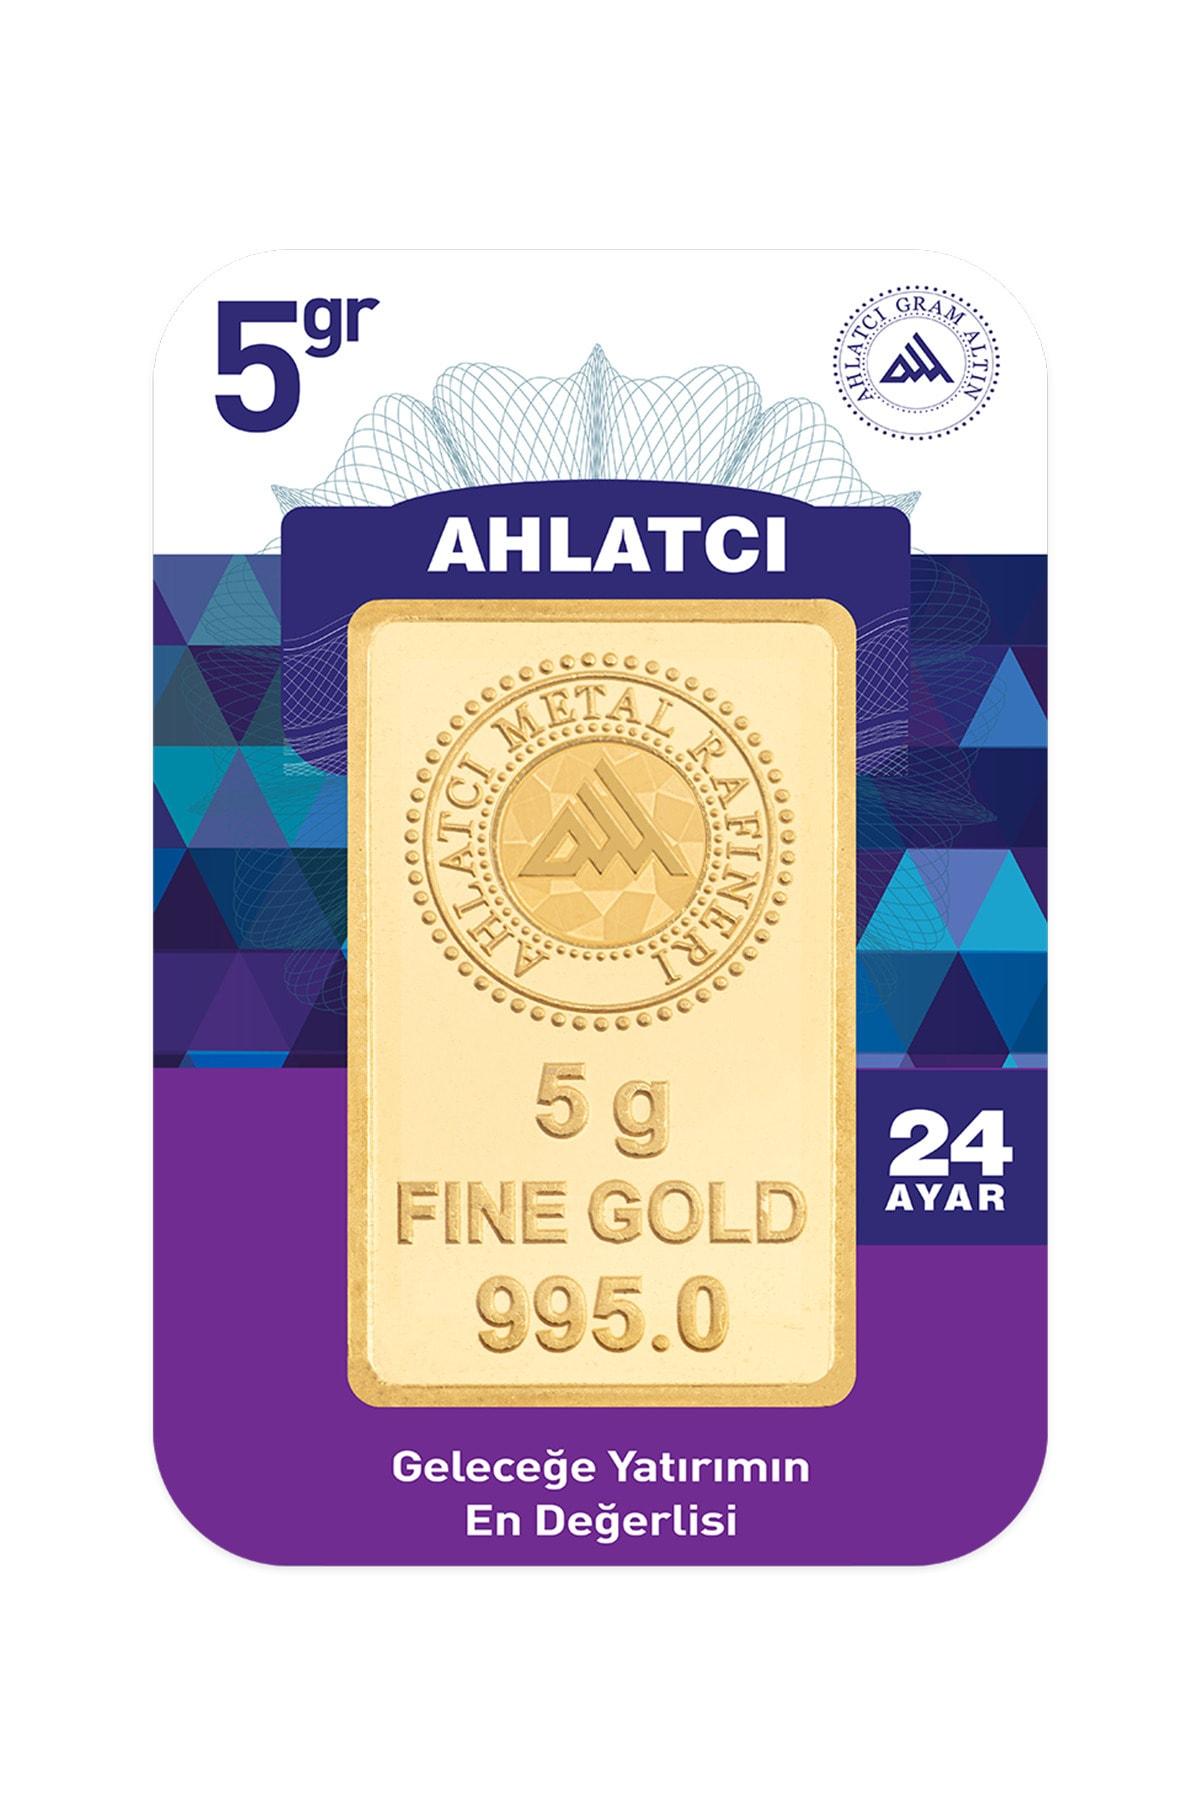 24 Ayar - 5g Altın